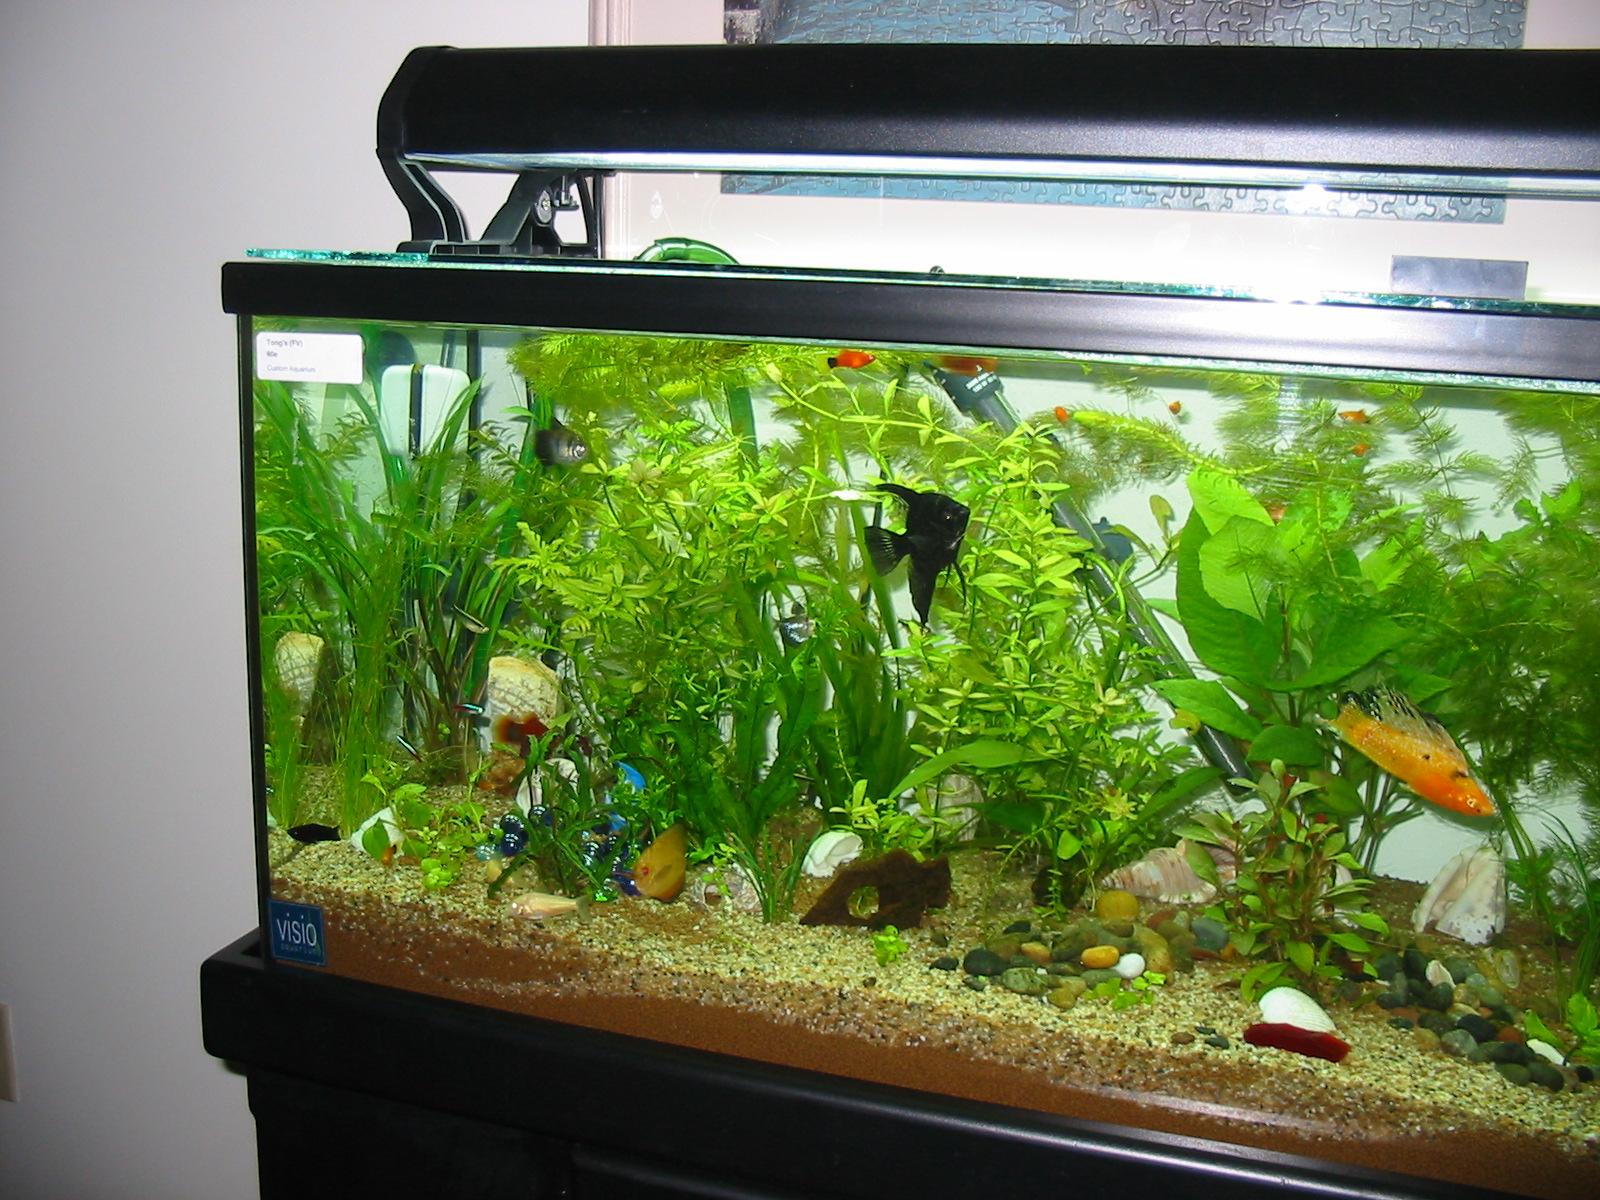 Popular Freshwater Aquarium Fish Types - Basics to Know